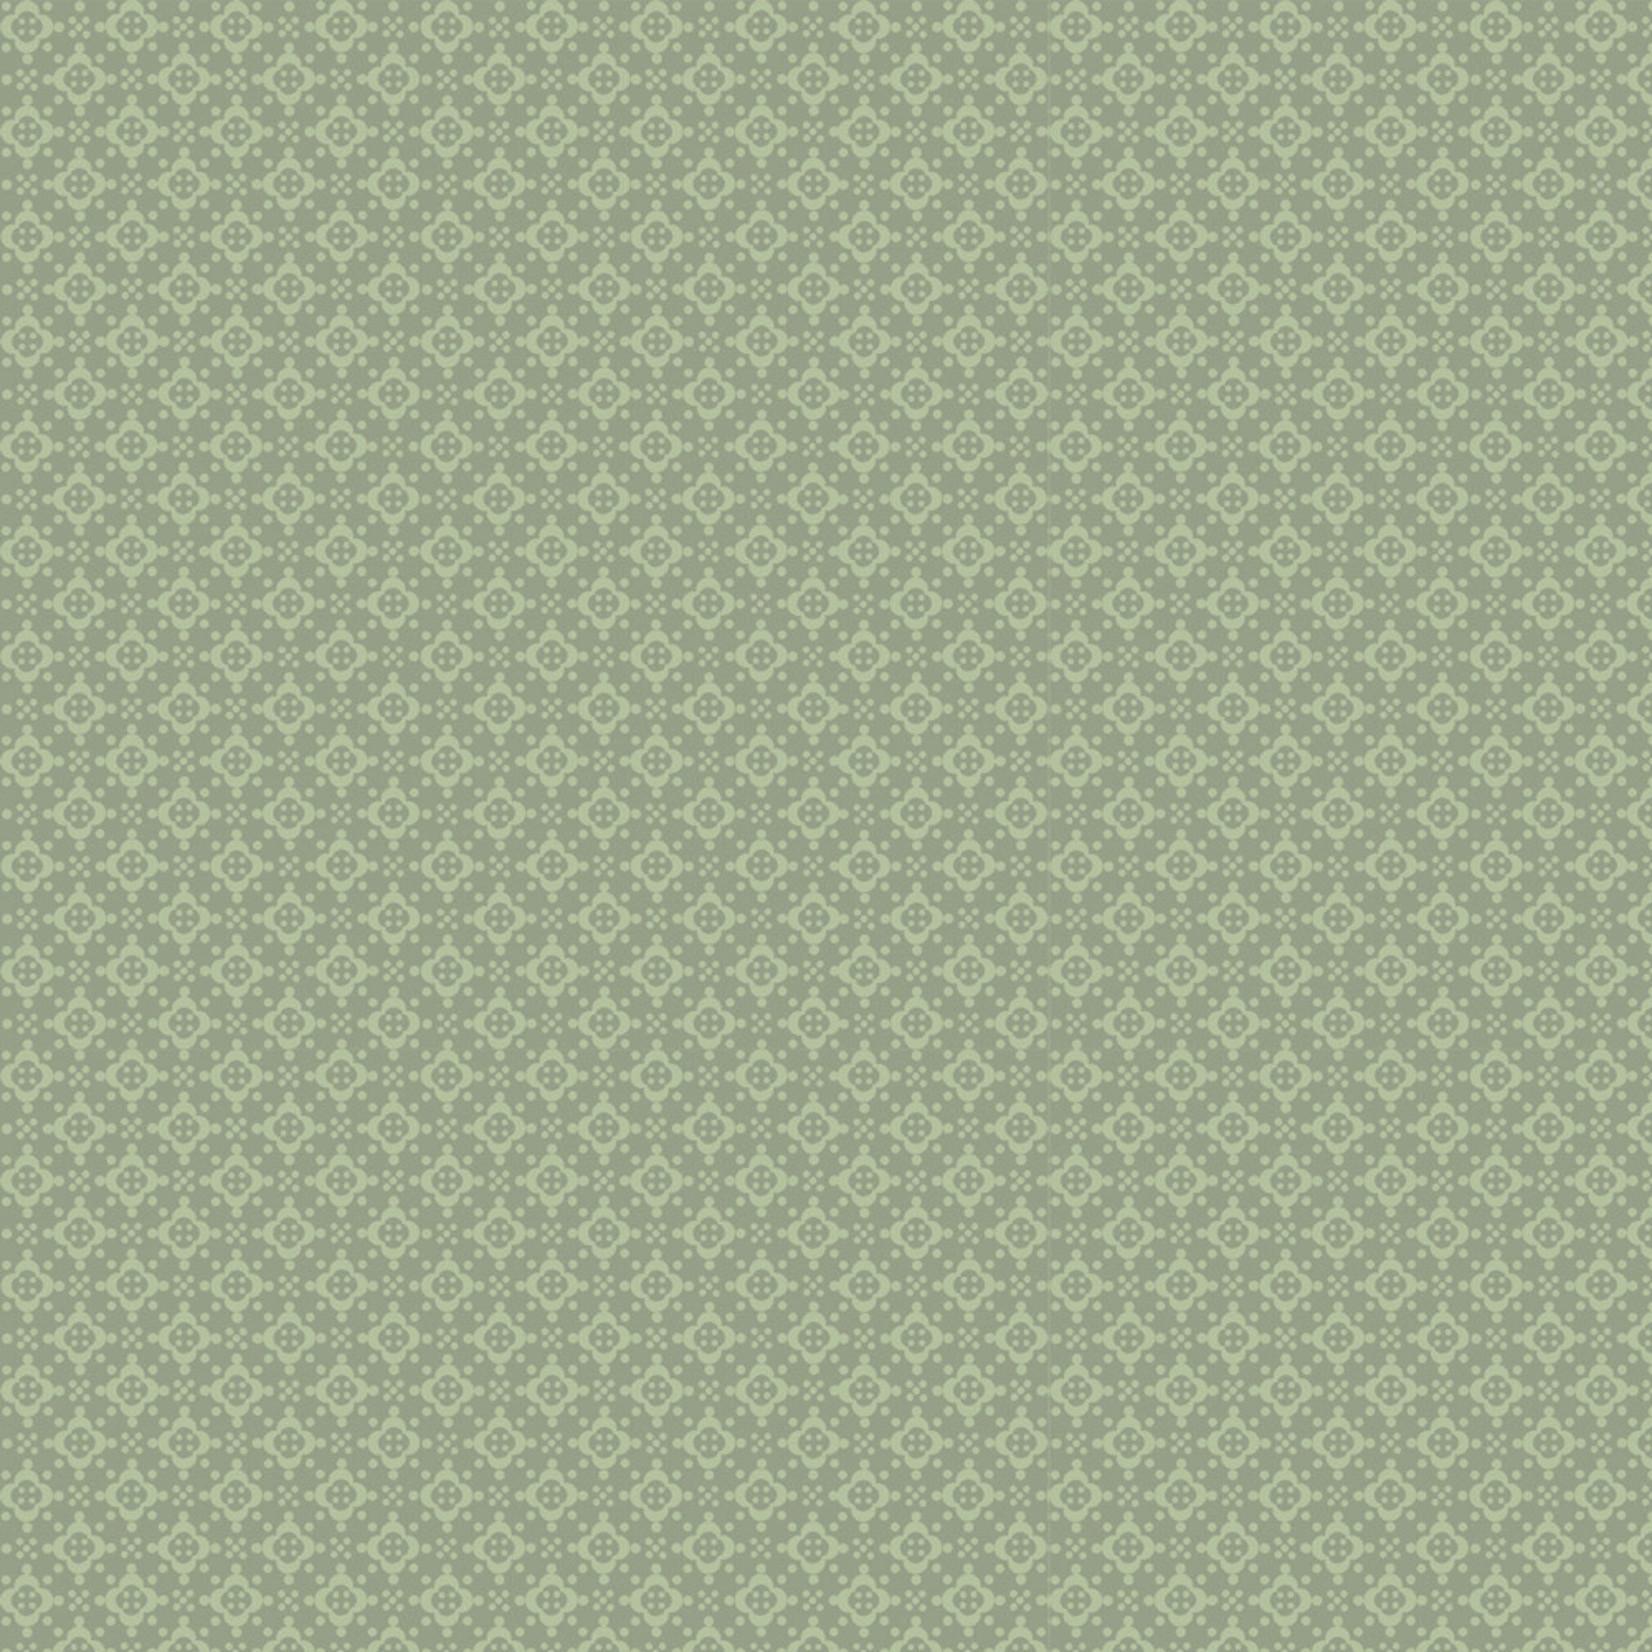 Stof Fabrics Hannah Basic - Structure - Green